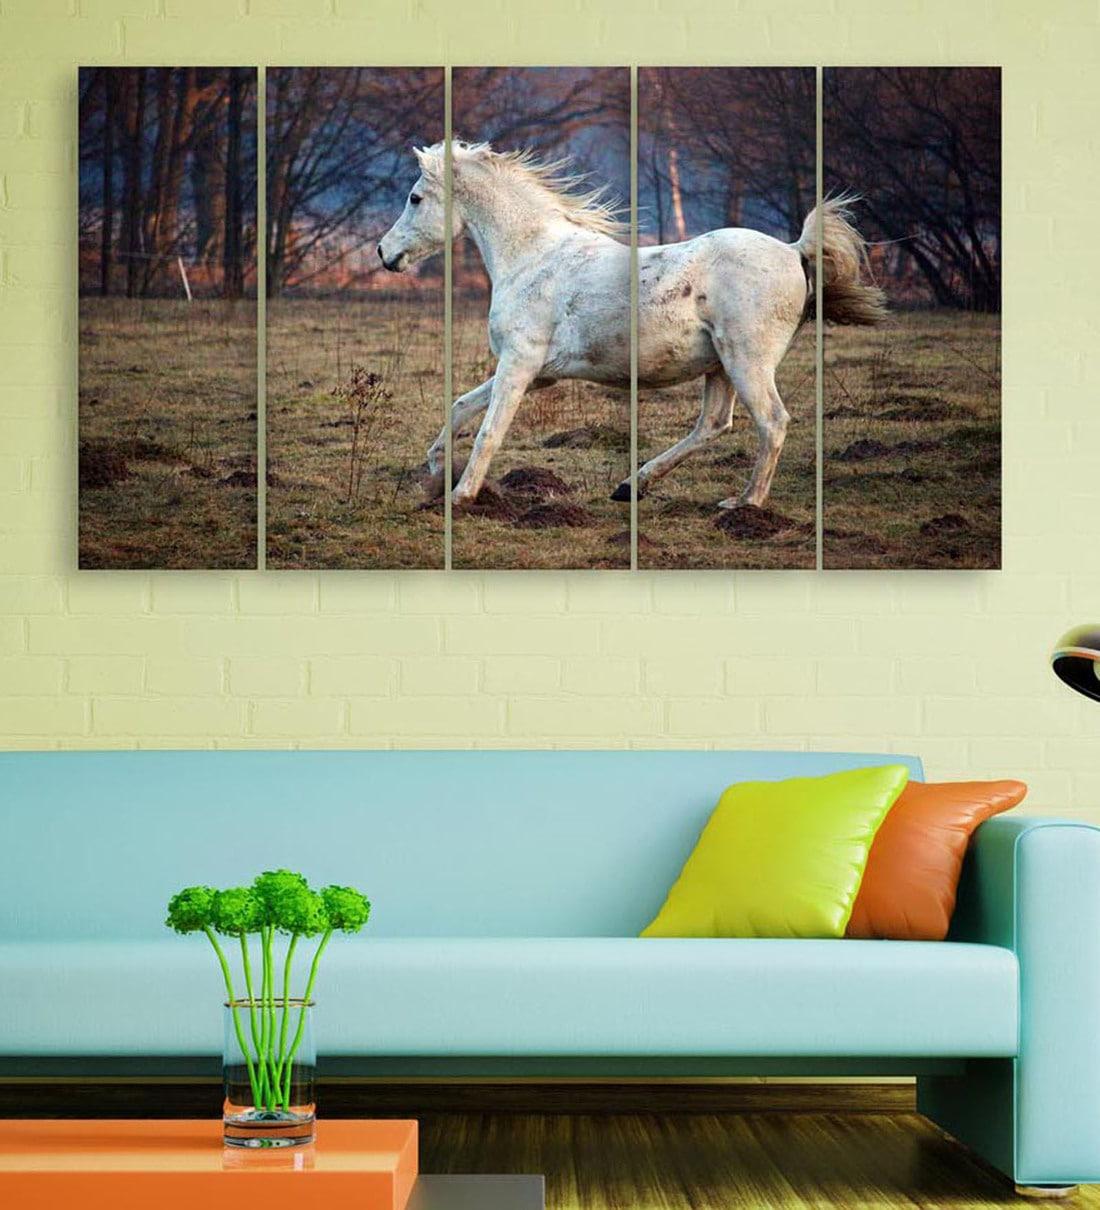 Buy Red Wood Multiple Frames Beautiful Running Horses Vastu Art Panels Set Of 5 By Inephos Online Wildlife Art Panels Art Panels Home Decor Pepperfry Product